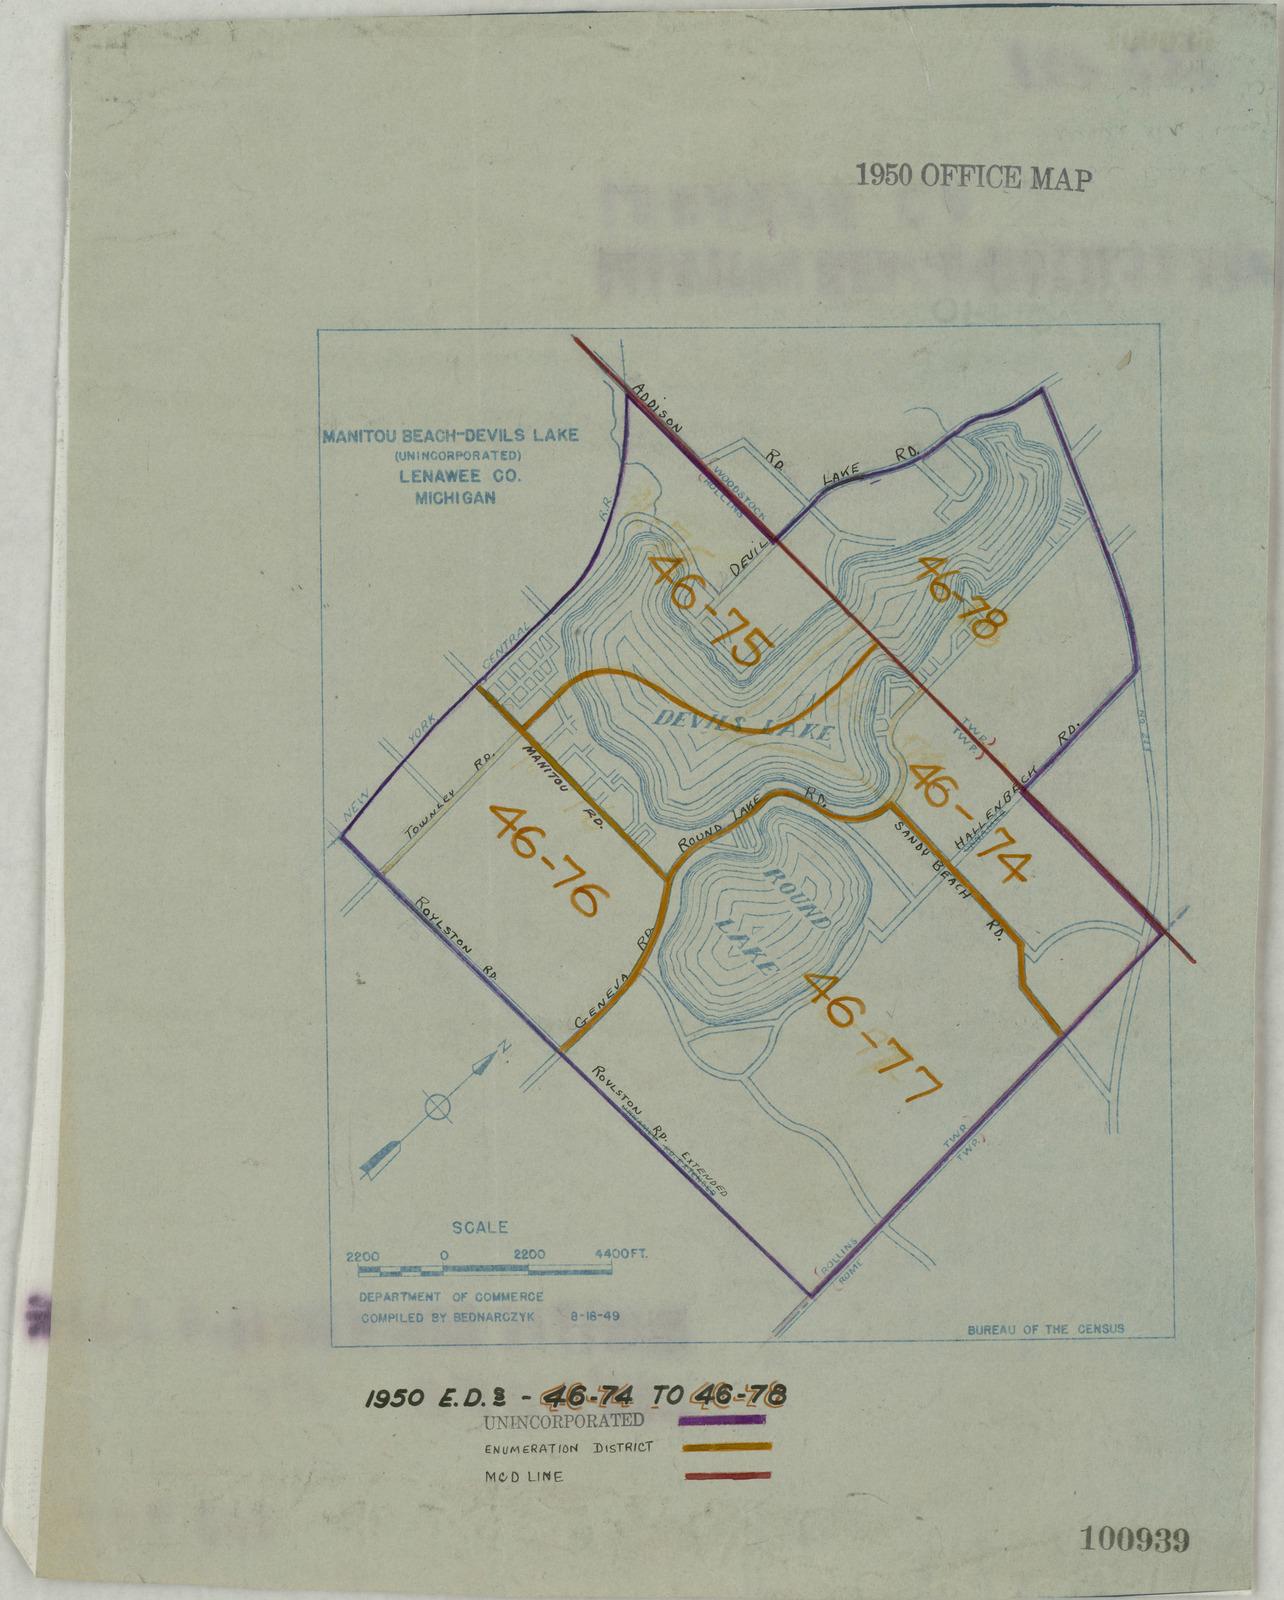 Addison Michigan Map.1950 Census Enumeration District Maps Michigan Mi Lenawee